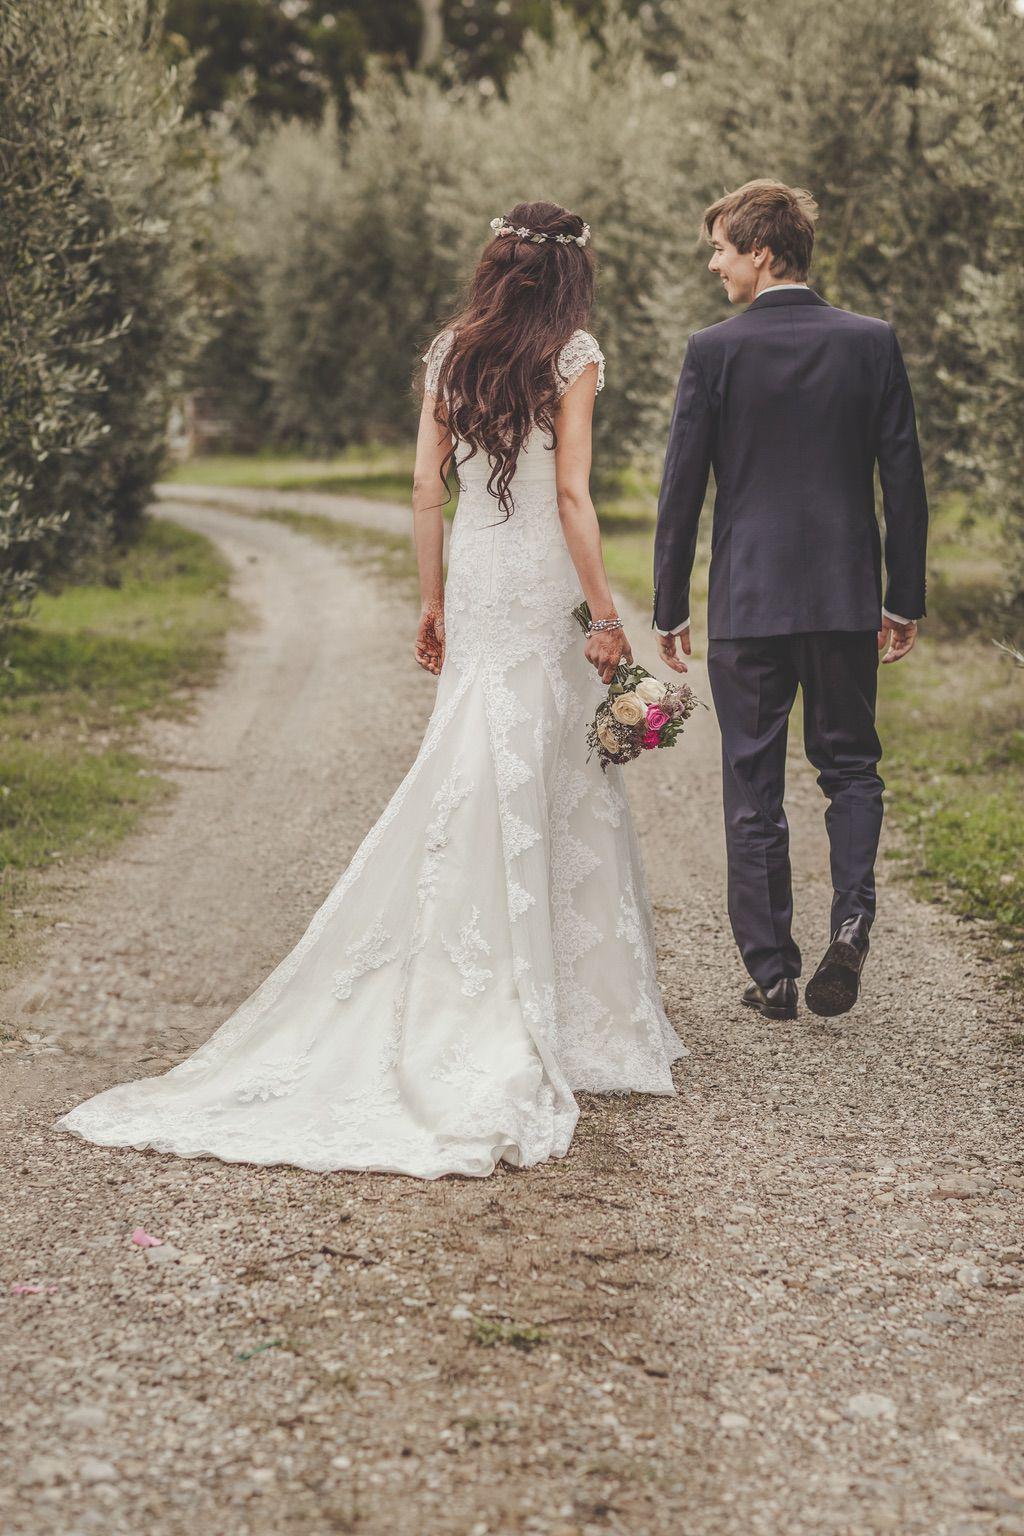 fusion-Pakistani-wedding-villa-catignano-052